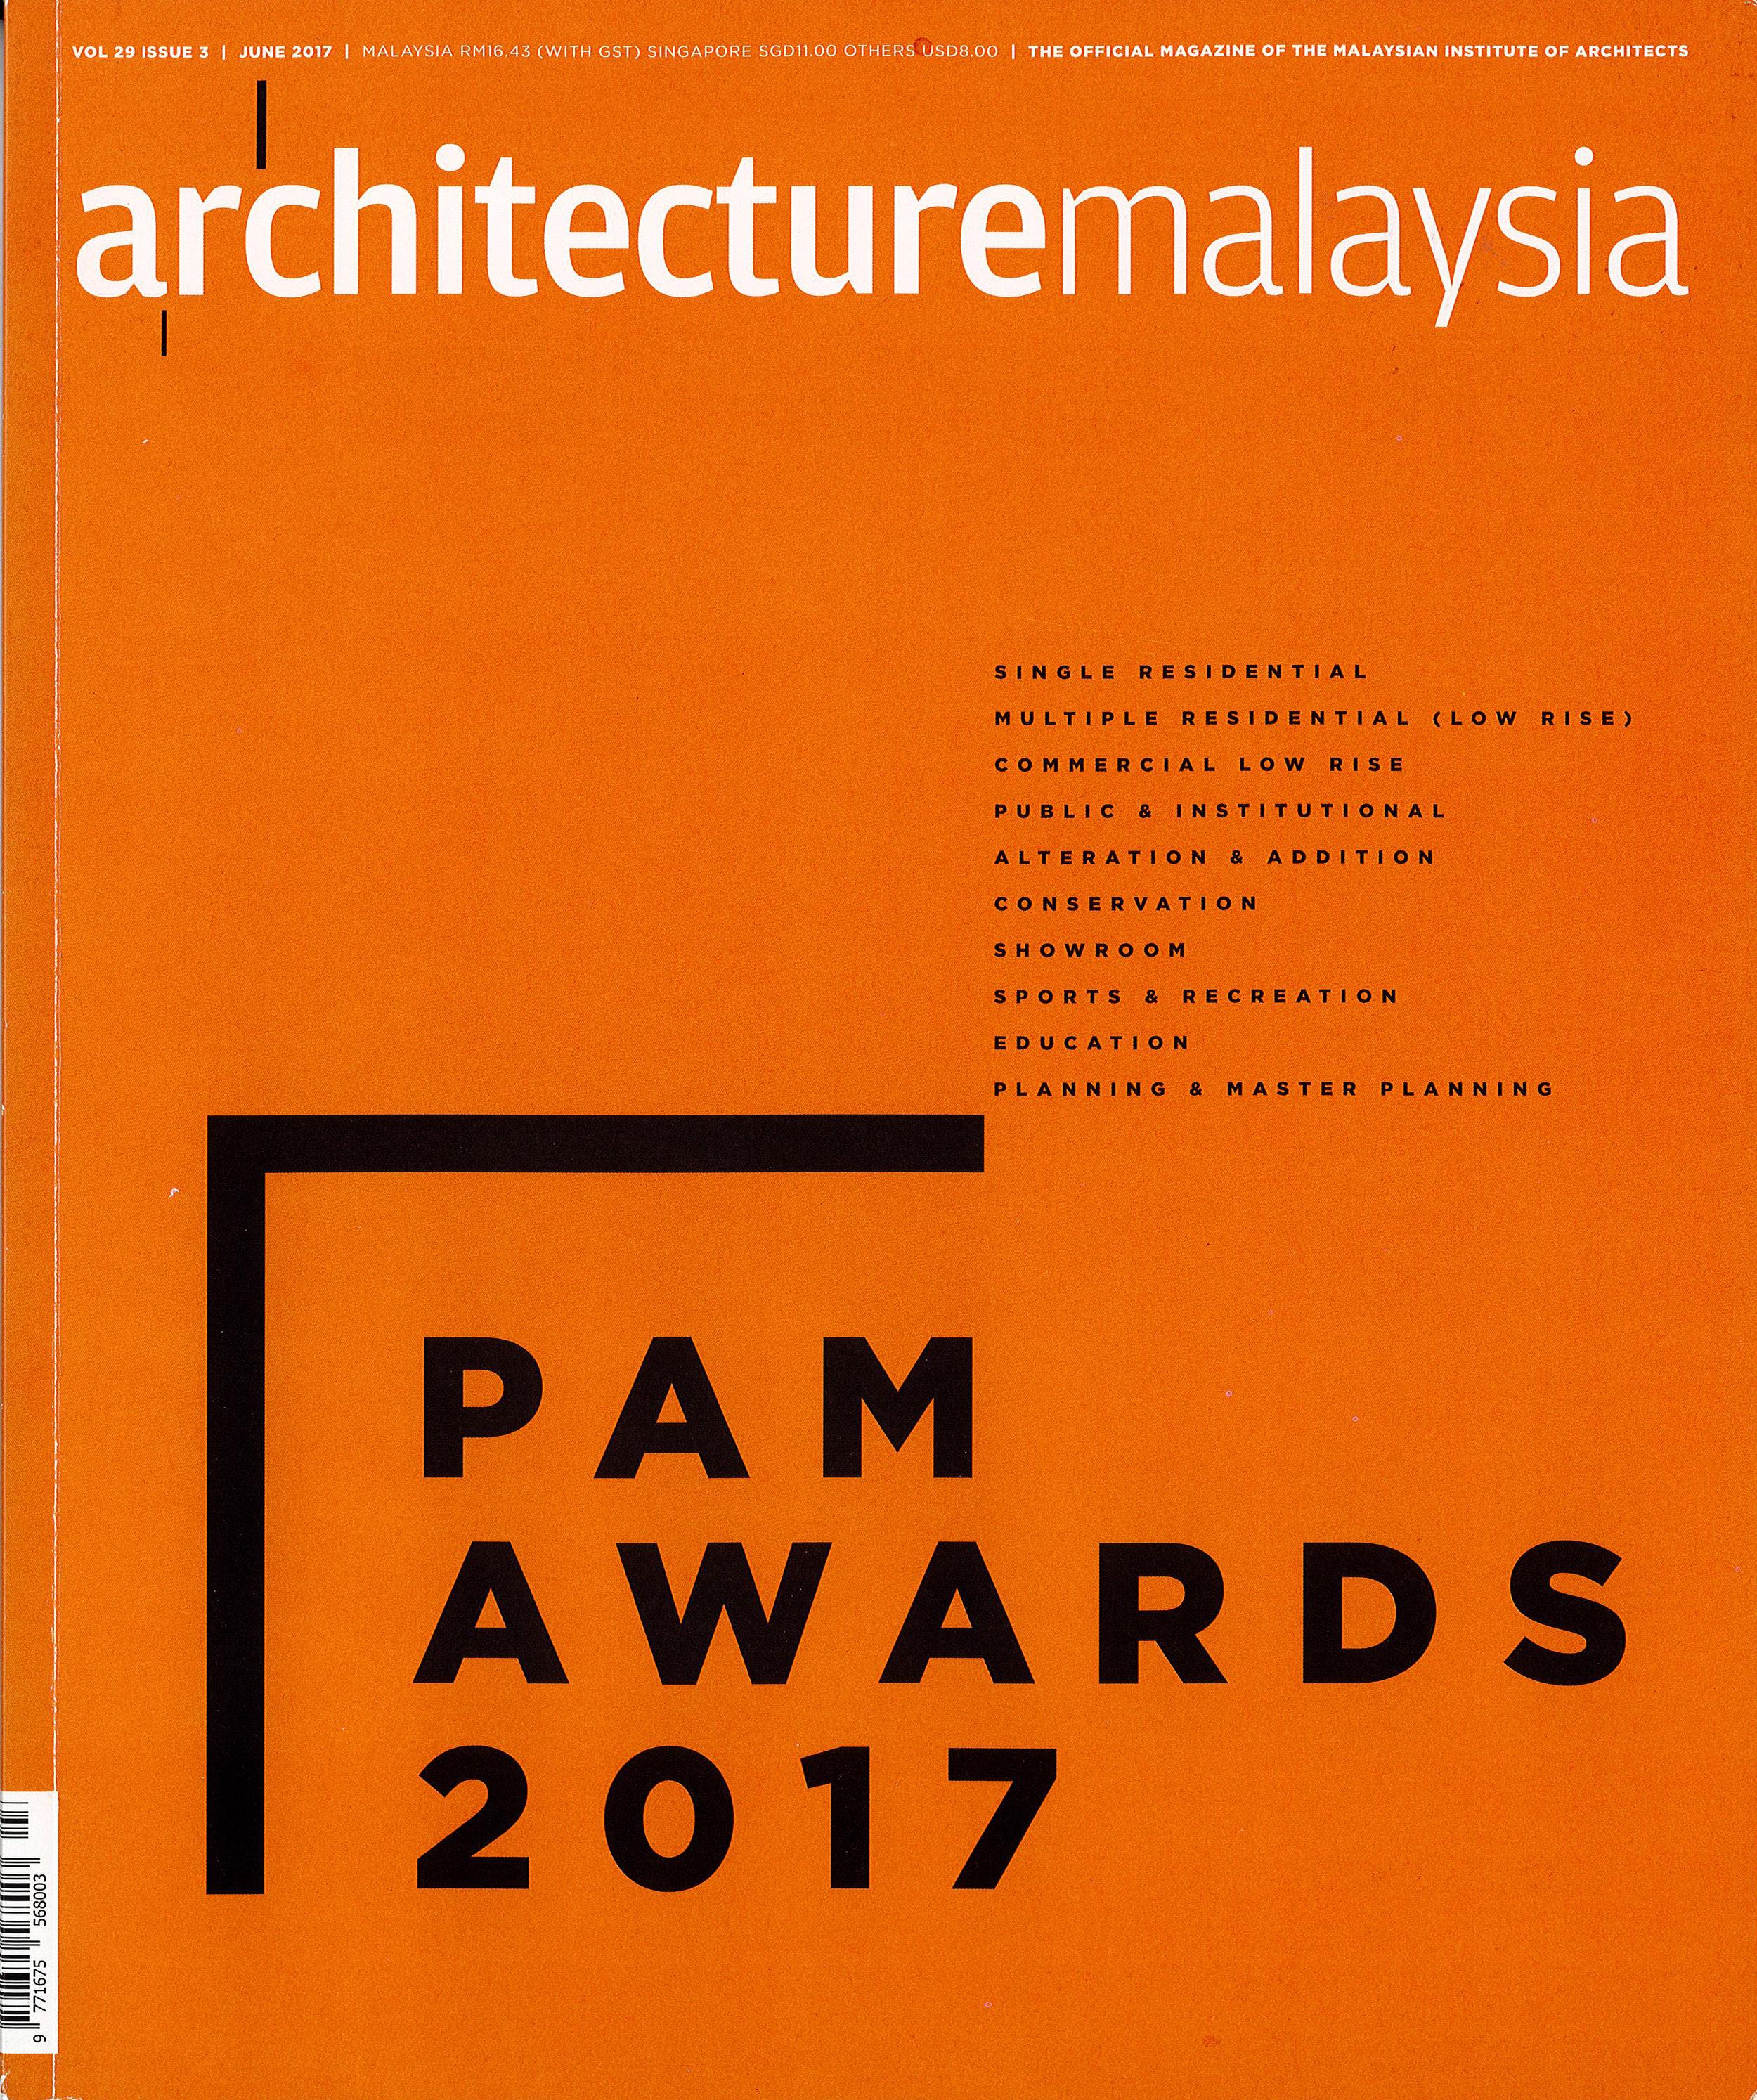 Architecture Malaysia - June 2017-1.jpg